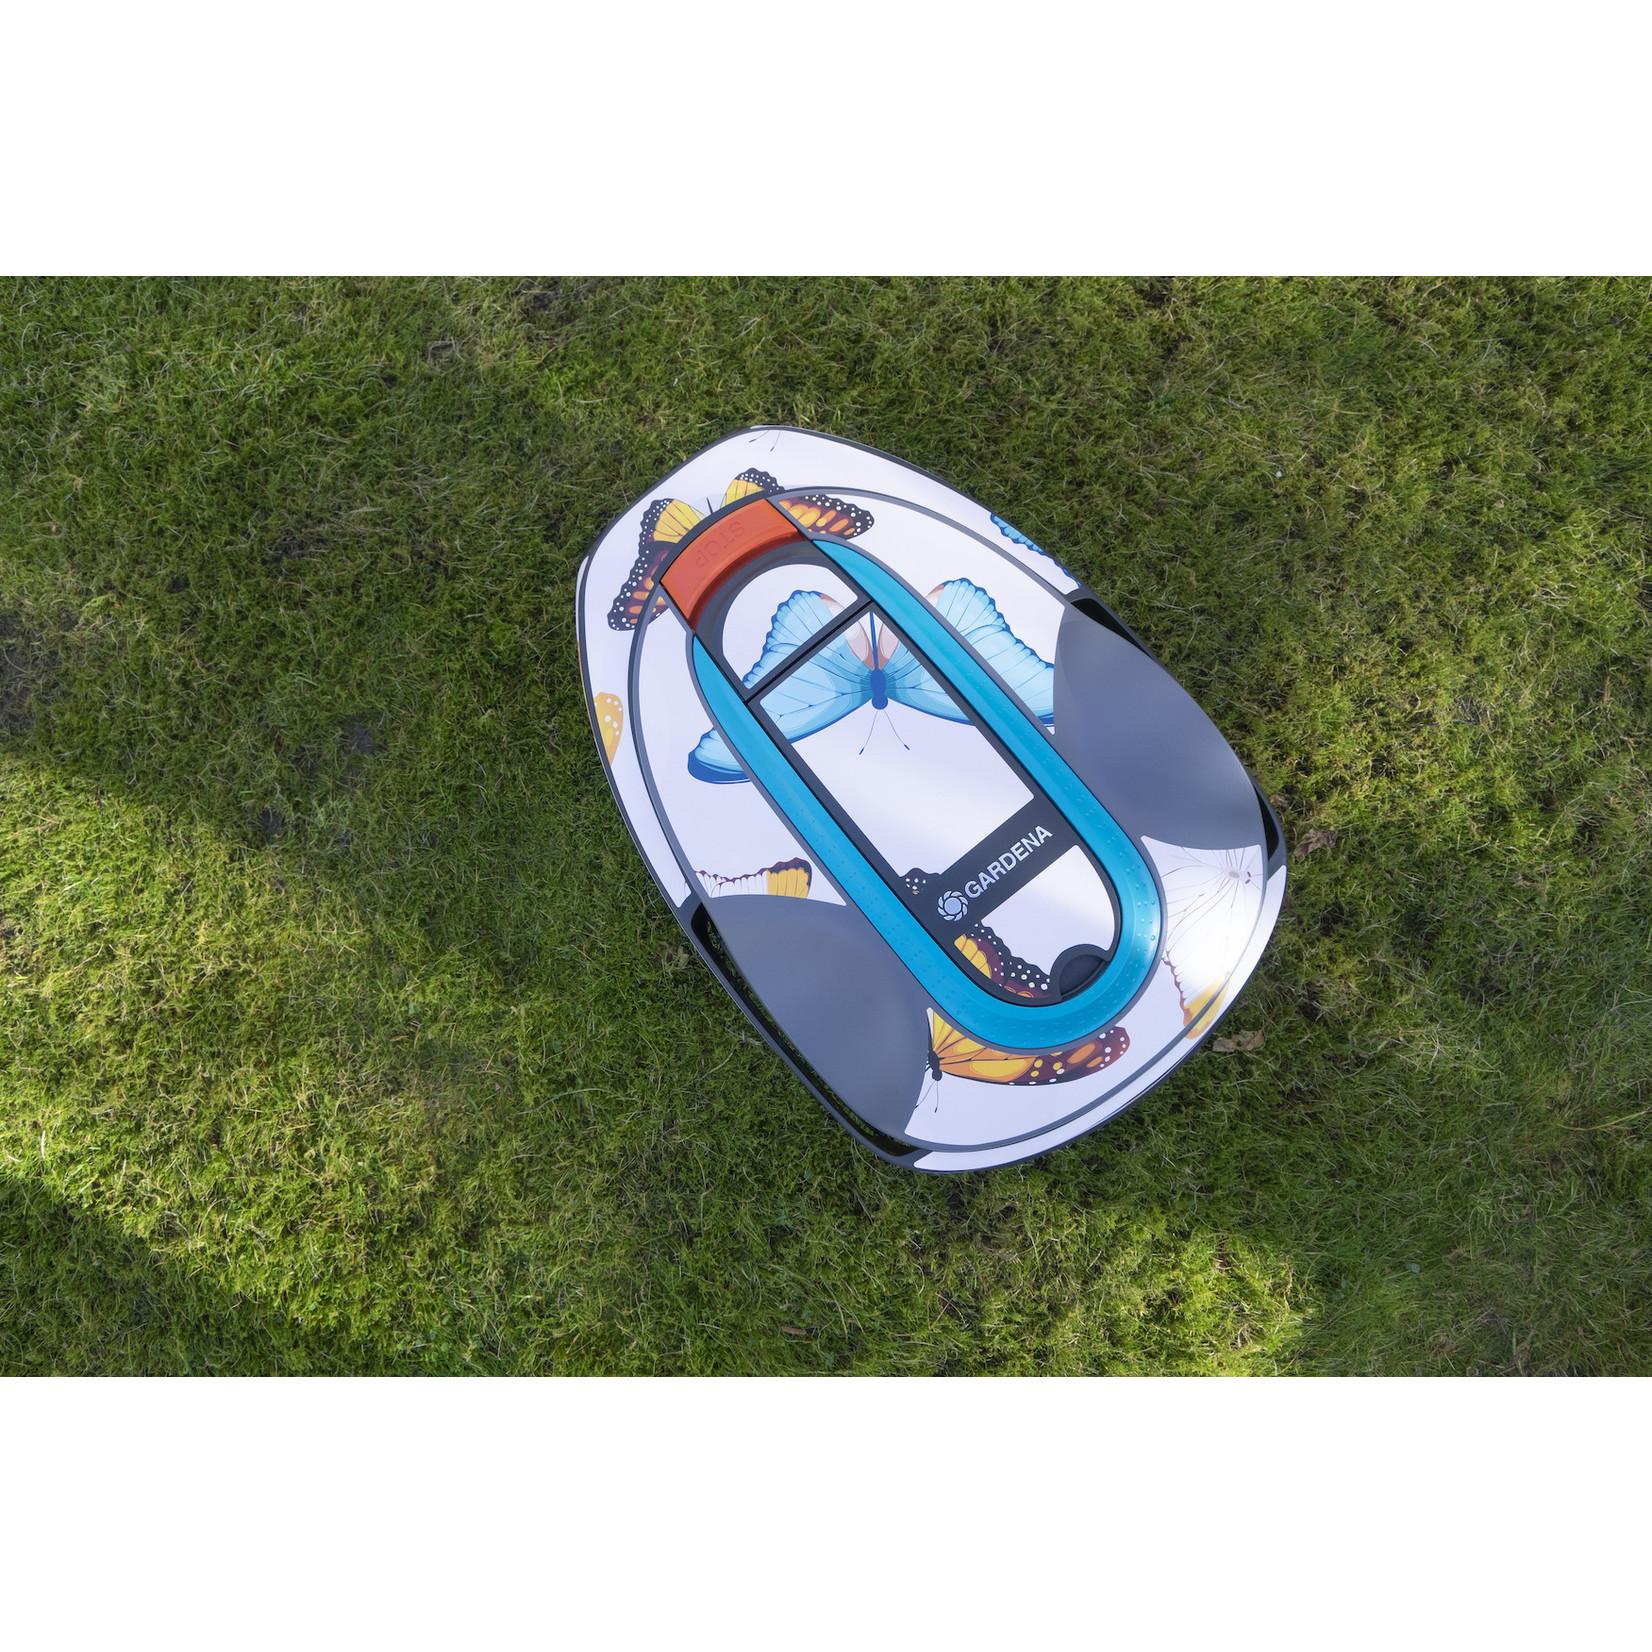 Twinckels Twinckels robotmaaier stickerset (Gardena Sileno) - Vlinder 3